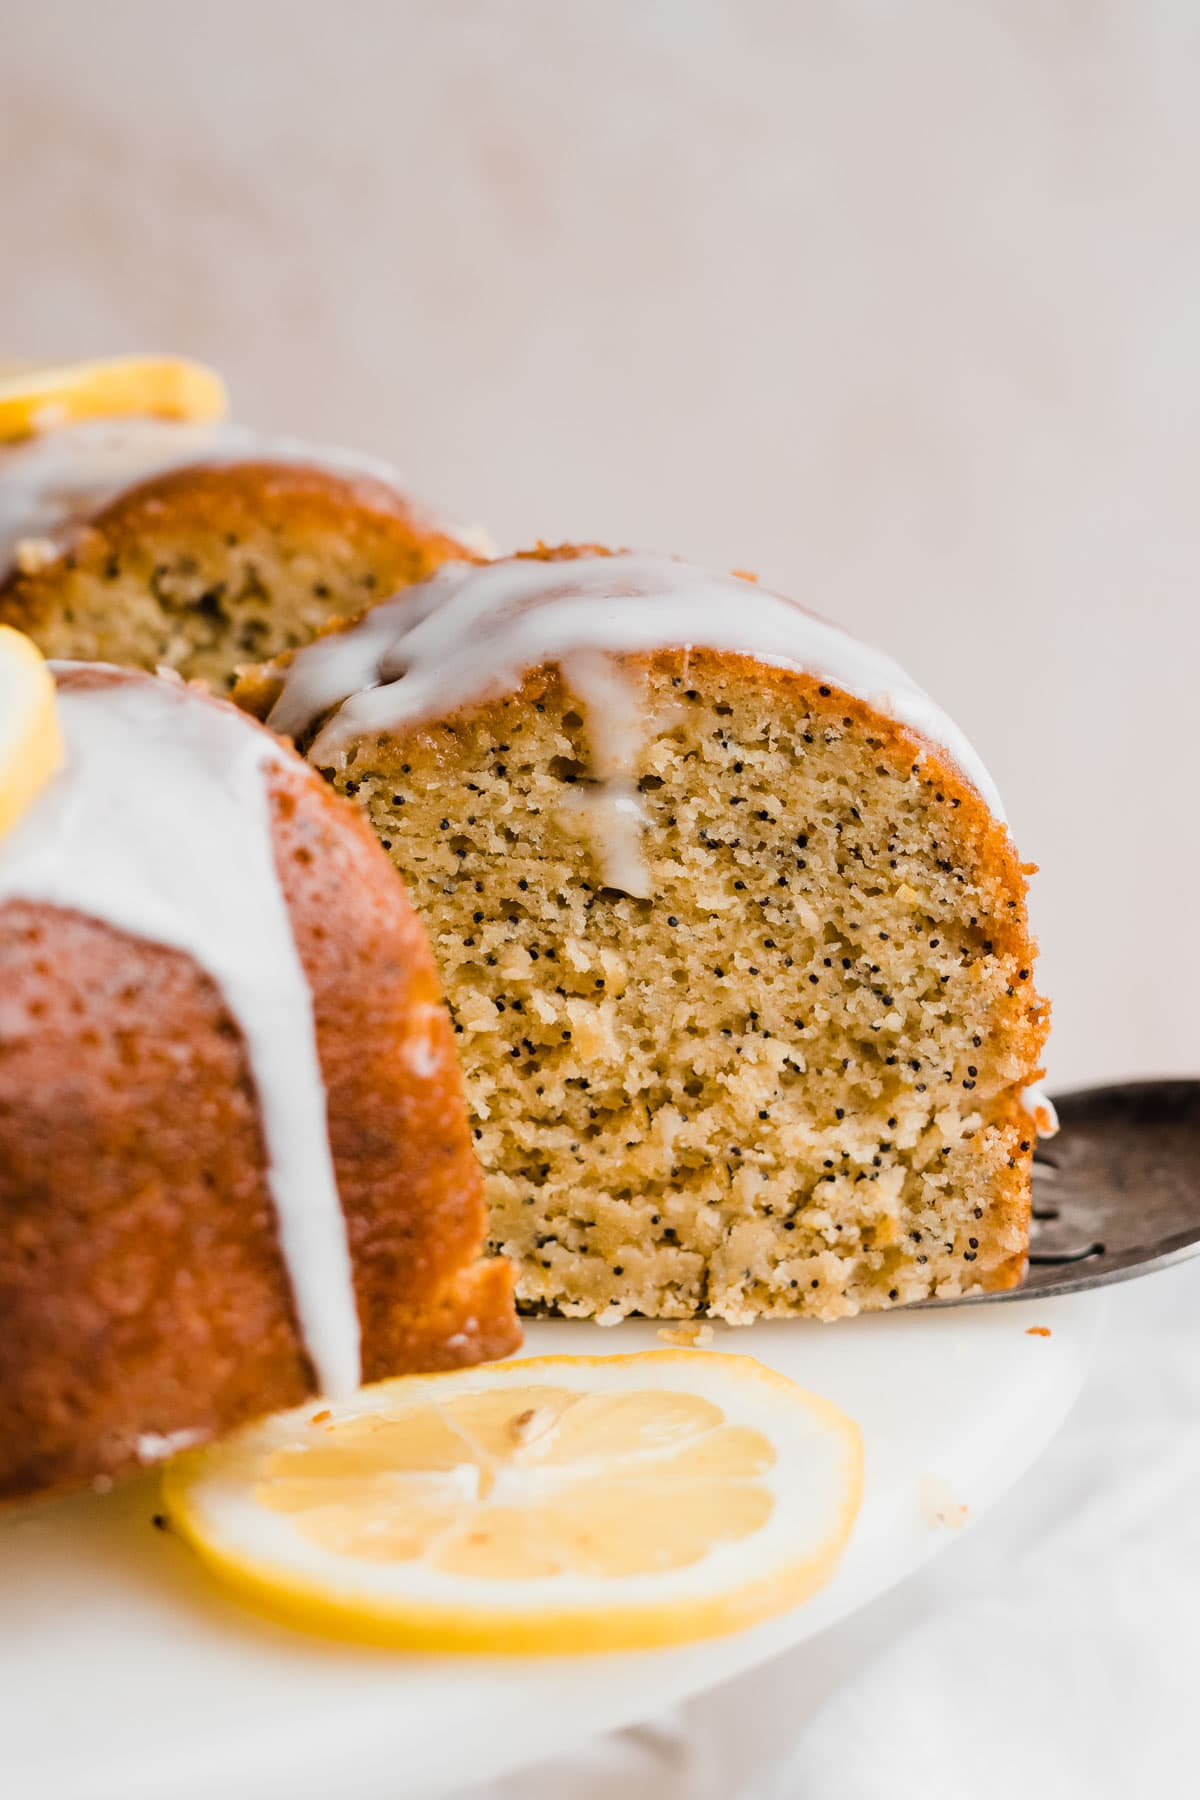 Lemon Poppy Seed Cake with Lemon Glaze